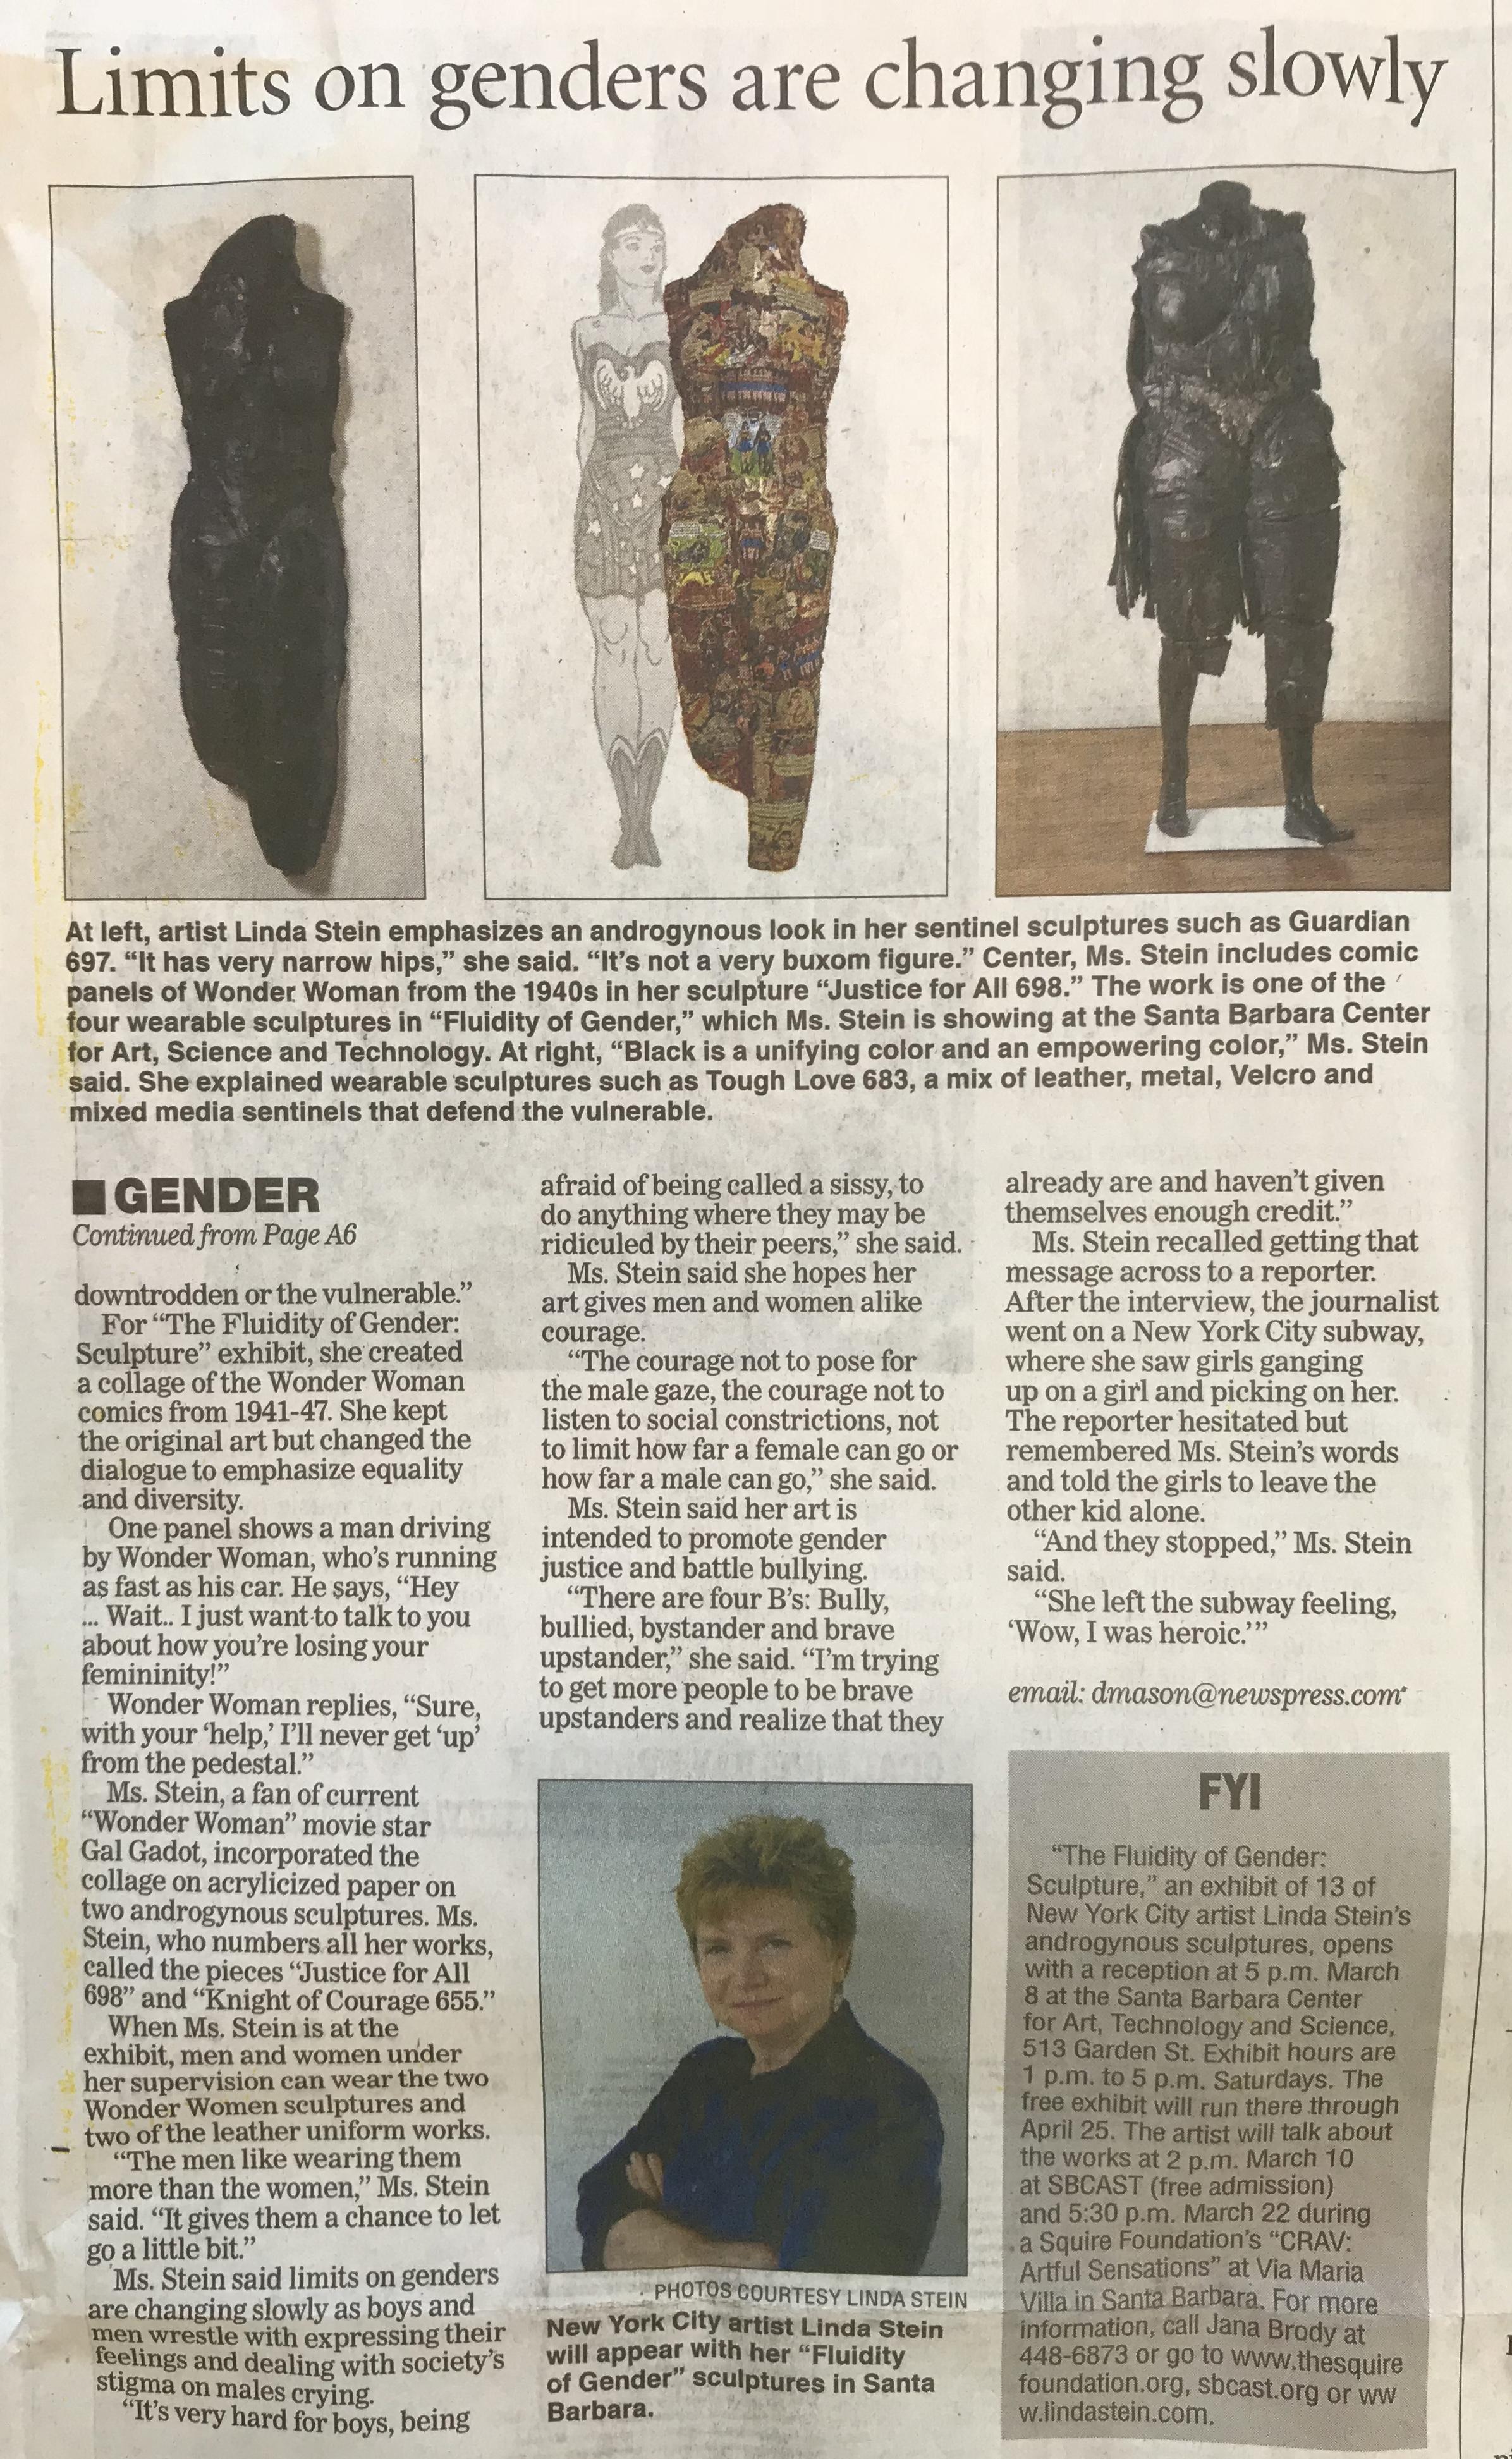 Linda Stein News Press 2